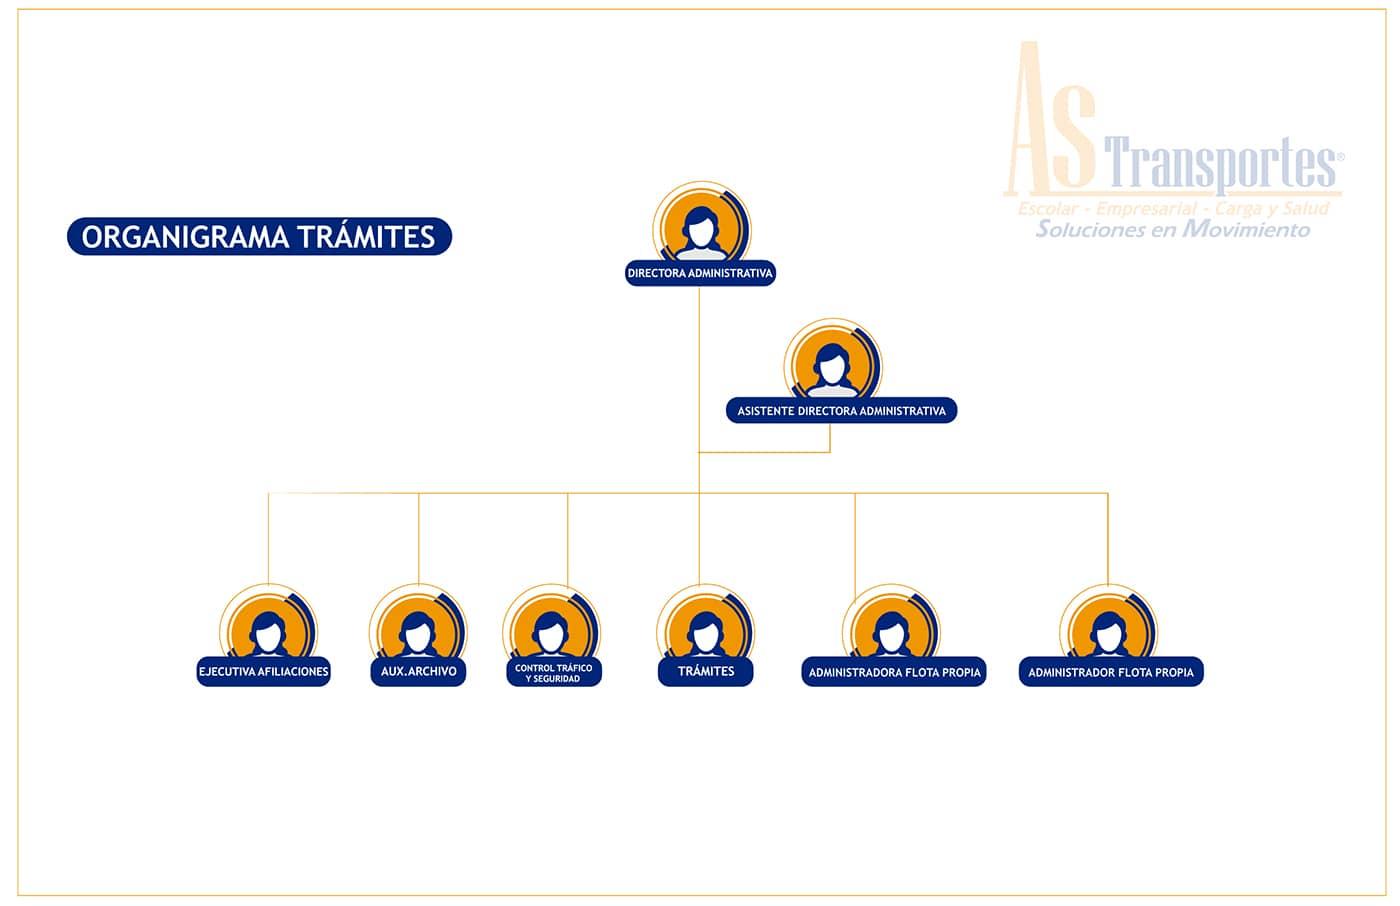 ORGANIGRAMA DE PAGINA WEB TRAMITES